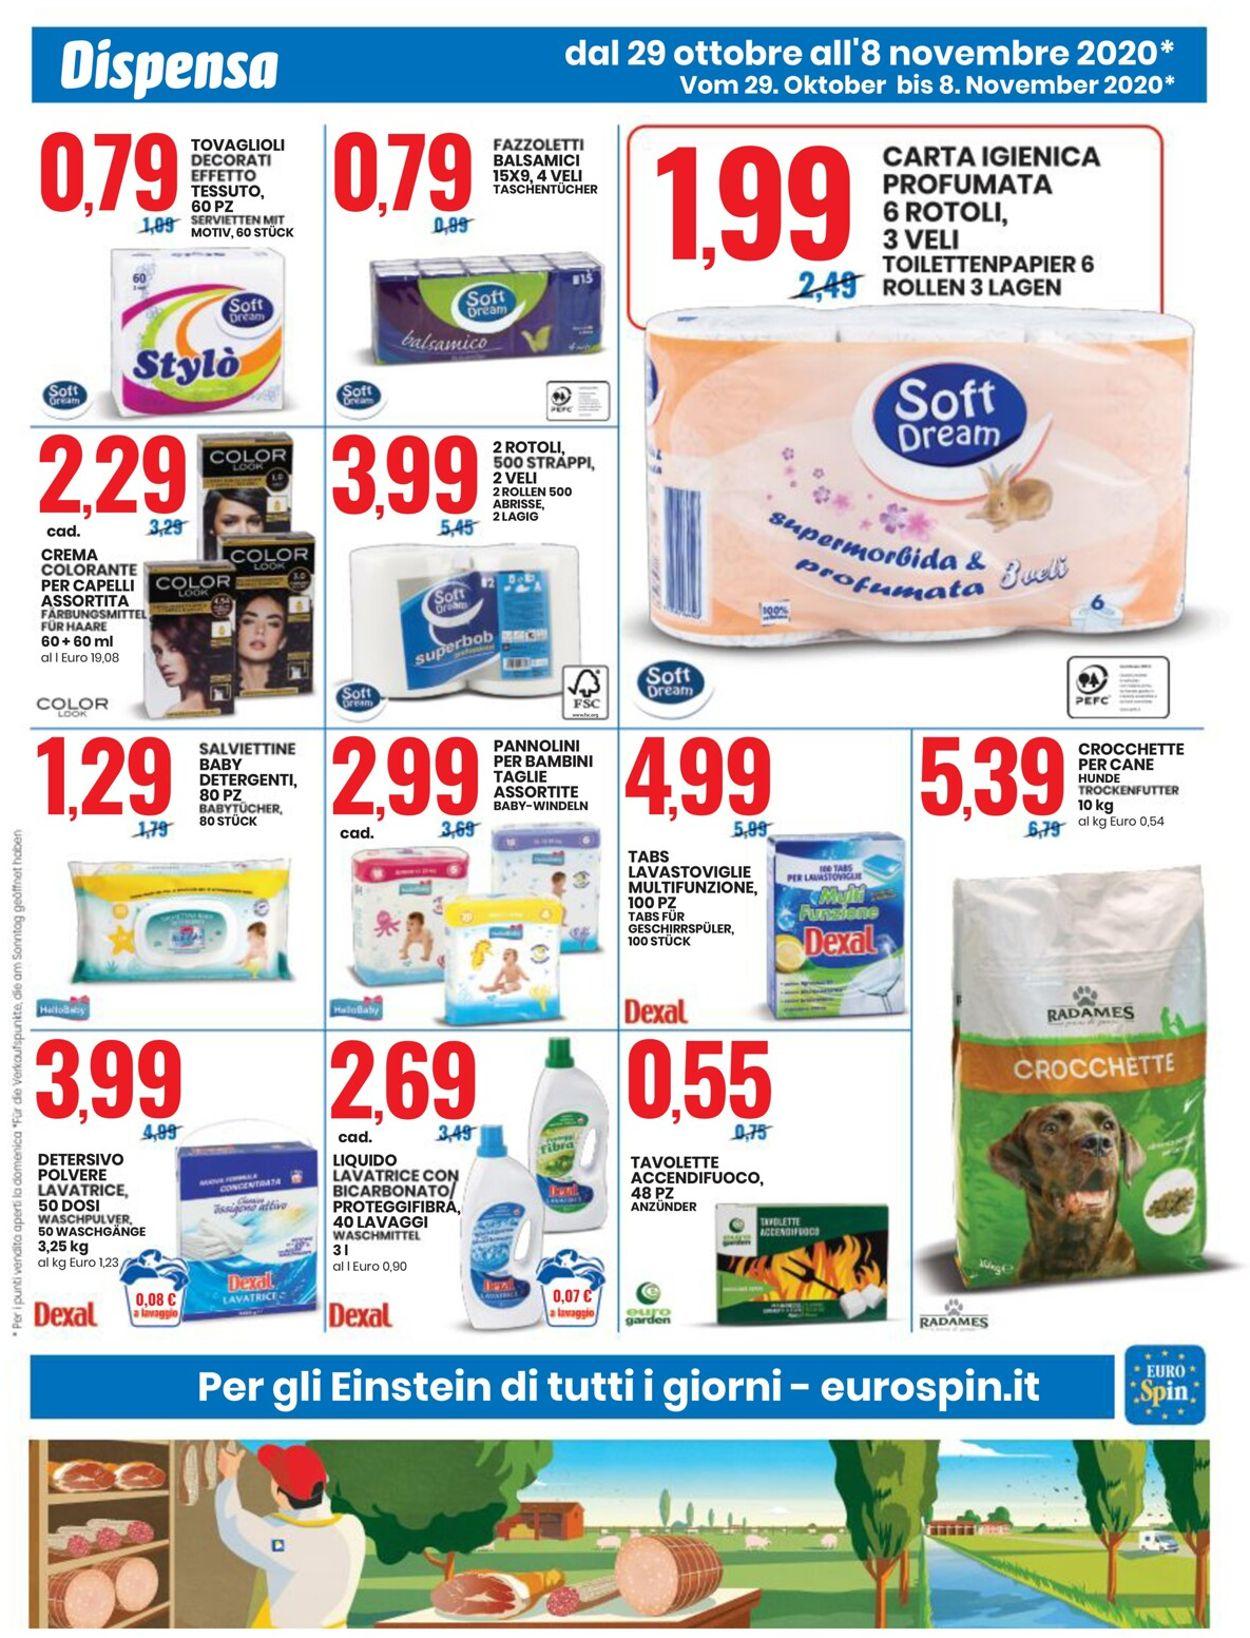 Volantino EURO Spin - Offerte 29/10-08/11/2020 (Pagina 7)